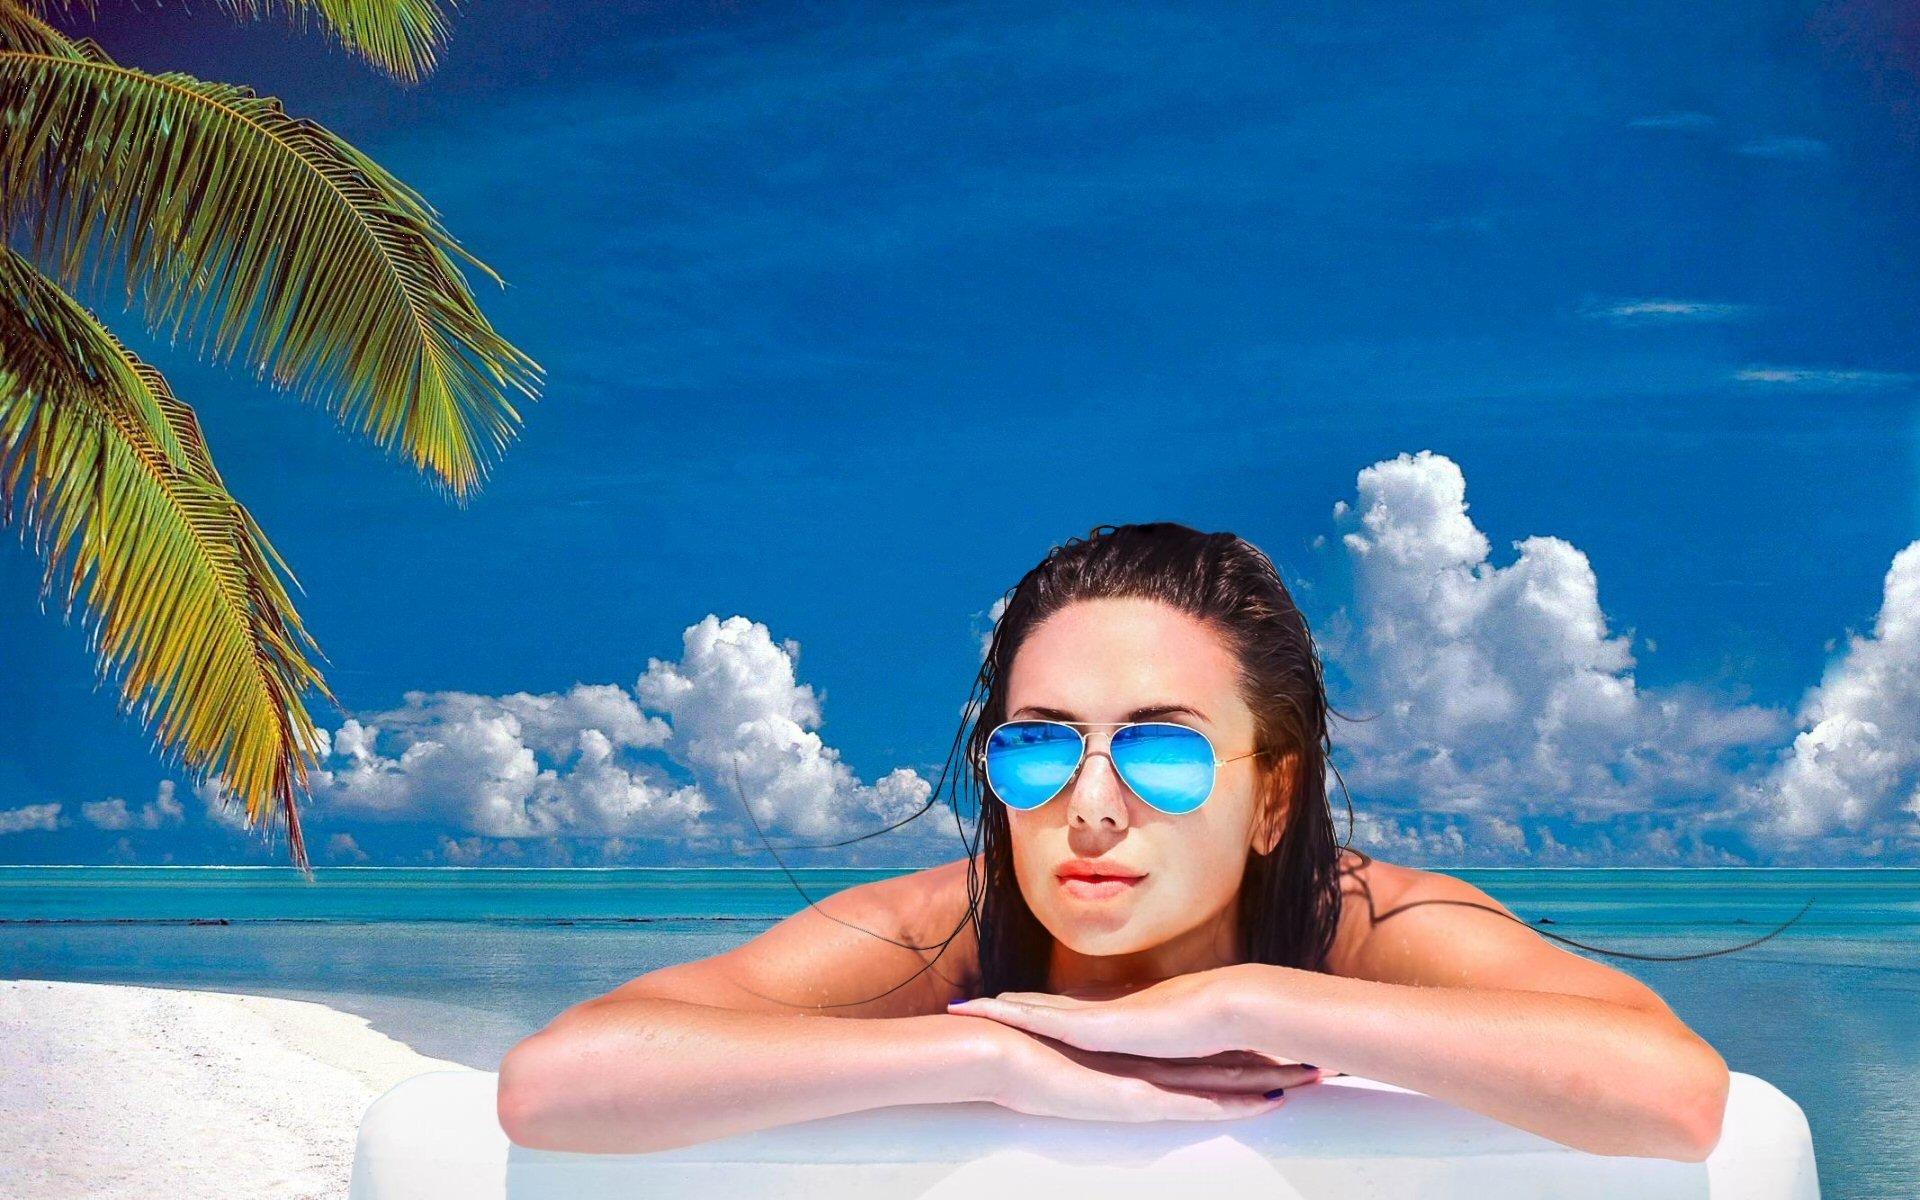 Women - Beautiful  Palm Tree Horizon Turquoise Tropical Sunny Blue Sunglasses Anya Slavalee Wallpaper